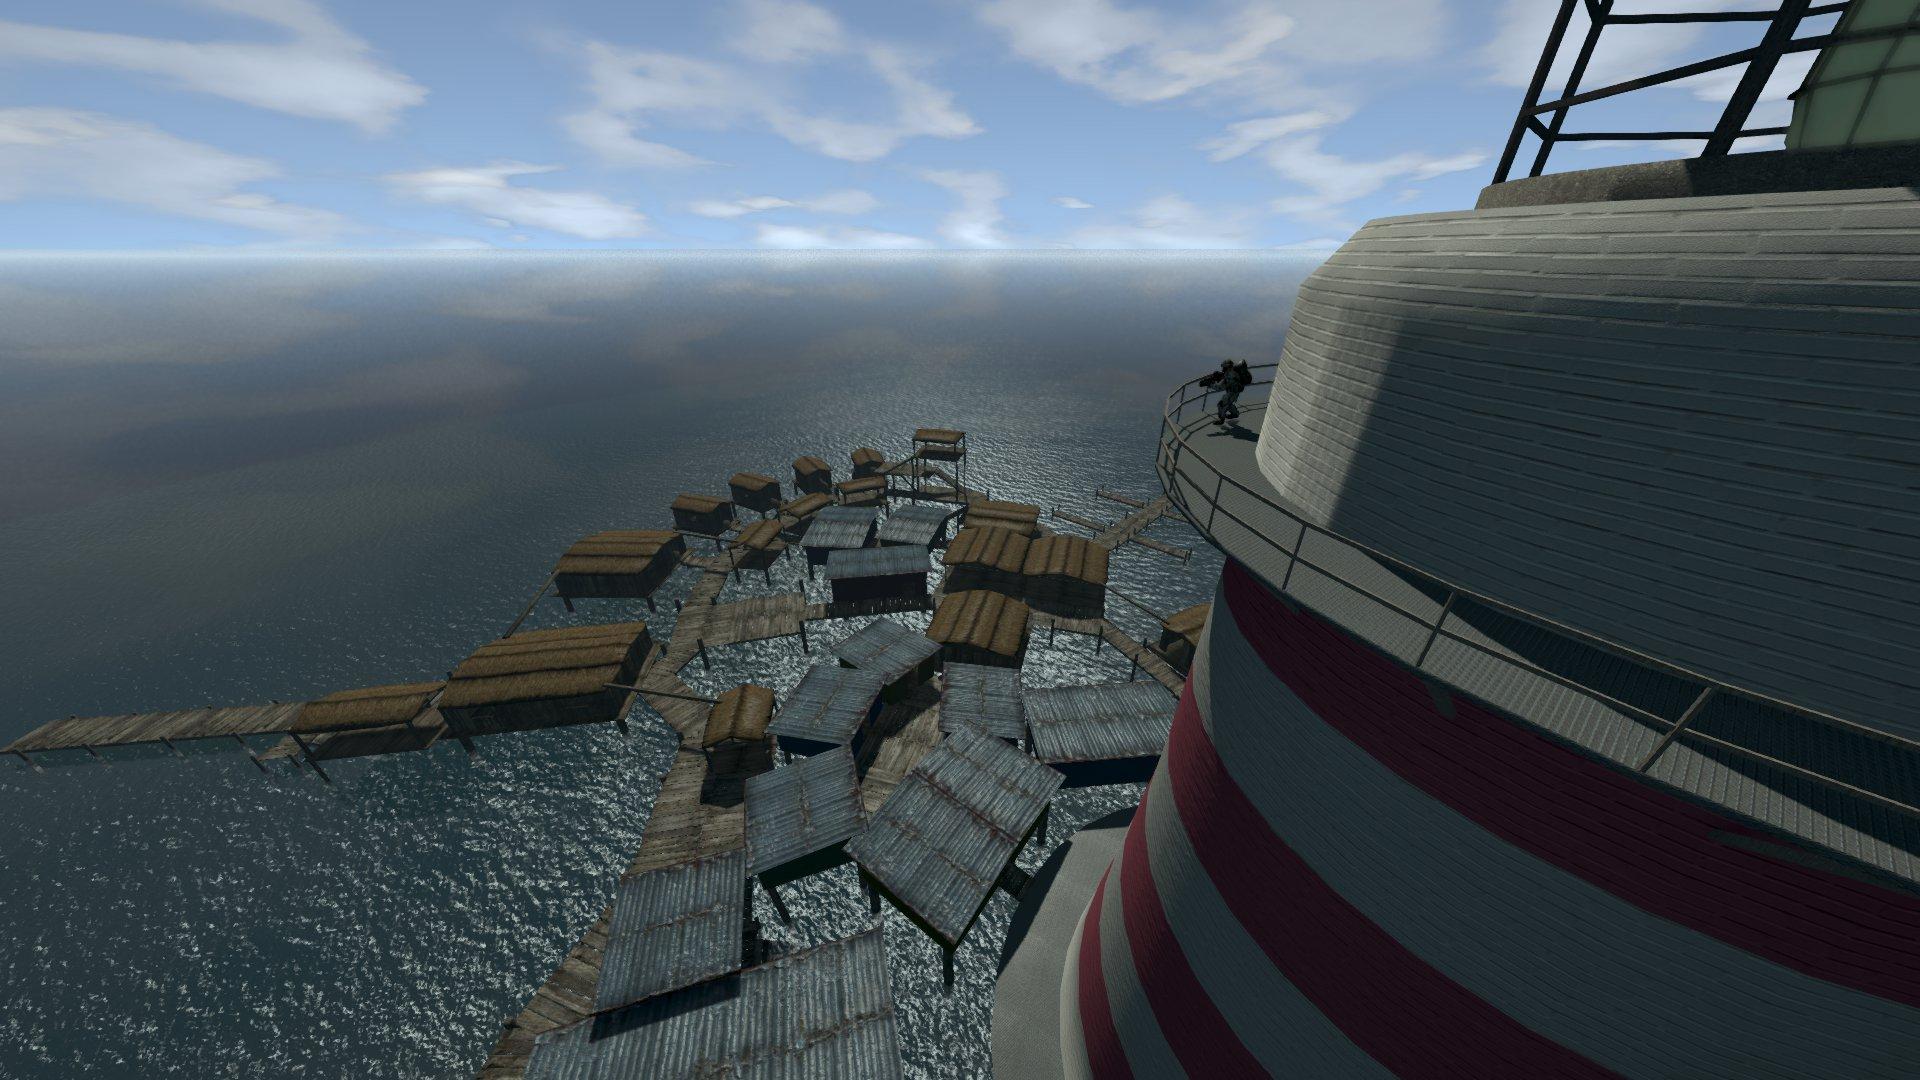 screenshot Pazifik Watertown by